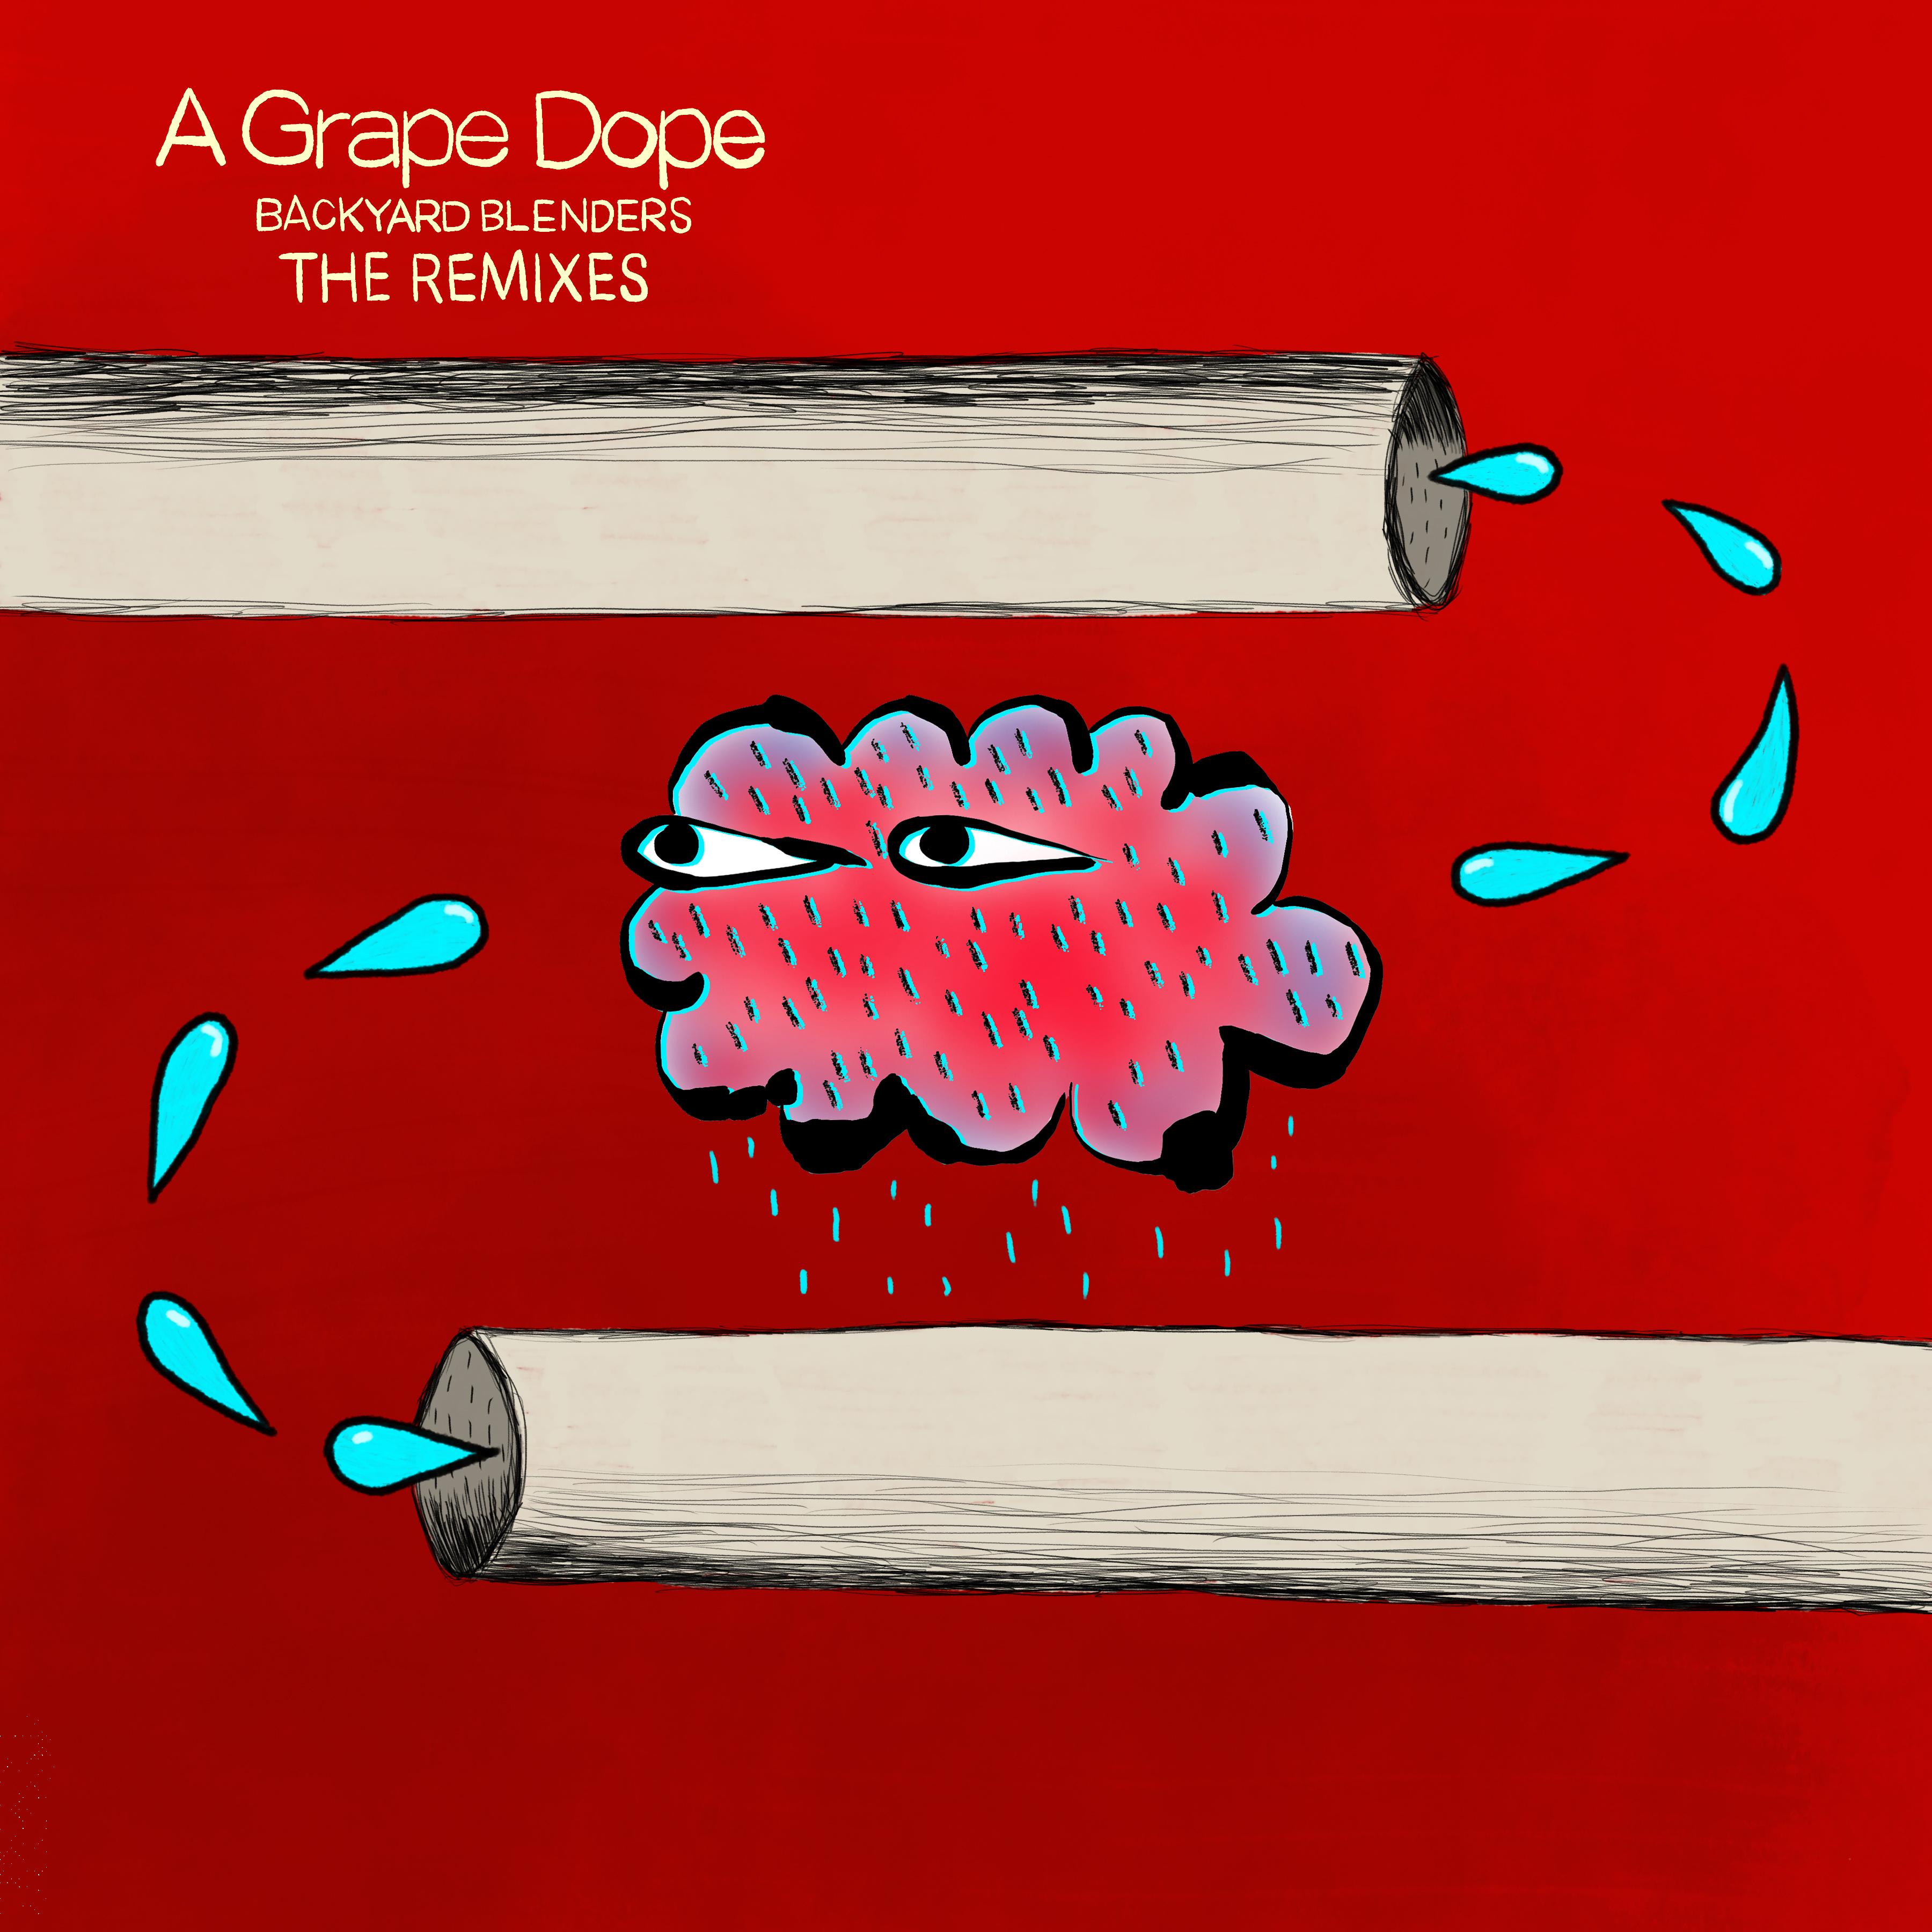 A Grape Dope - Backyard Blenders: The Remixes - Digital